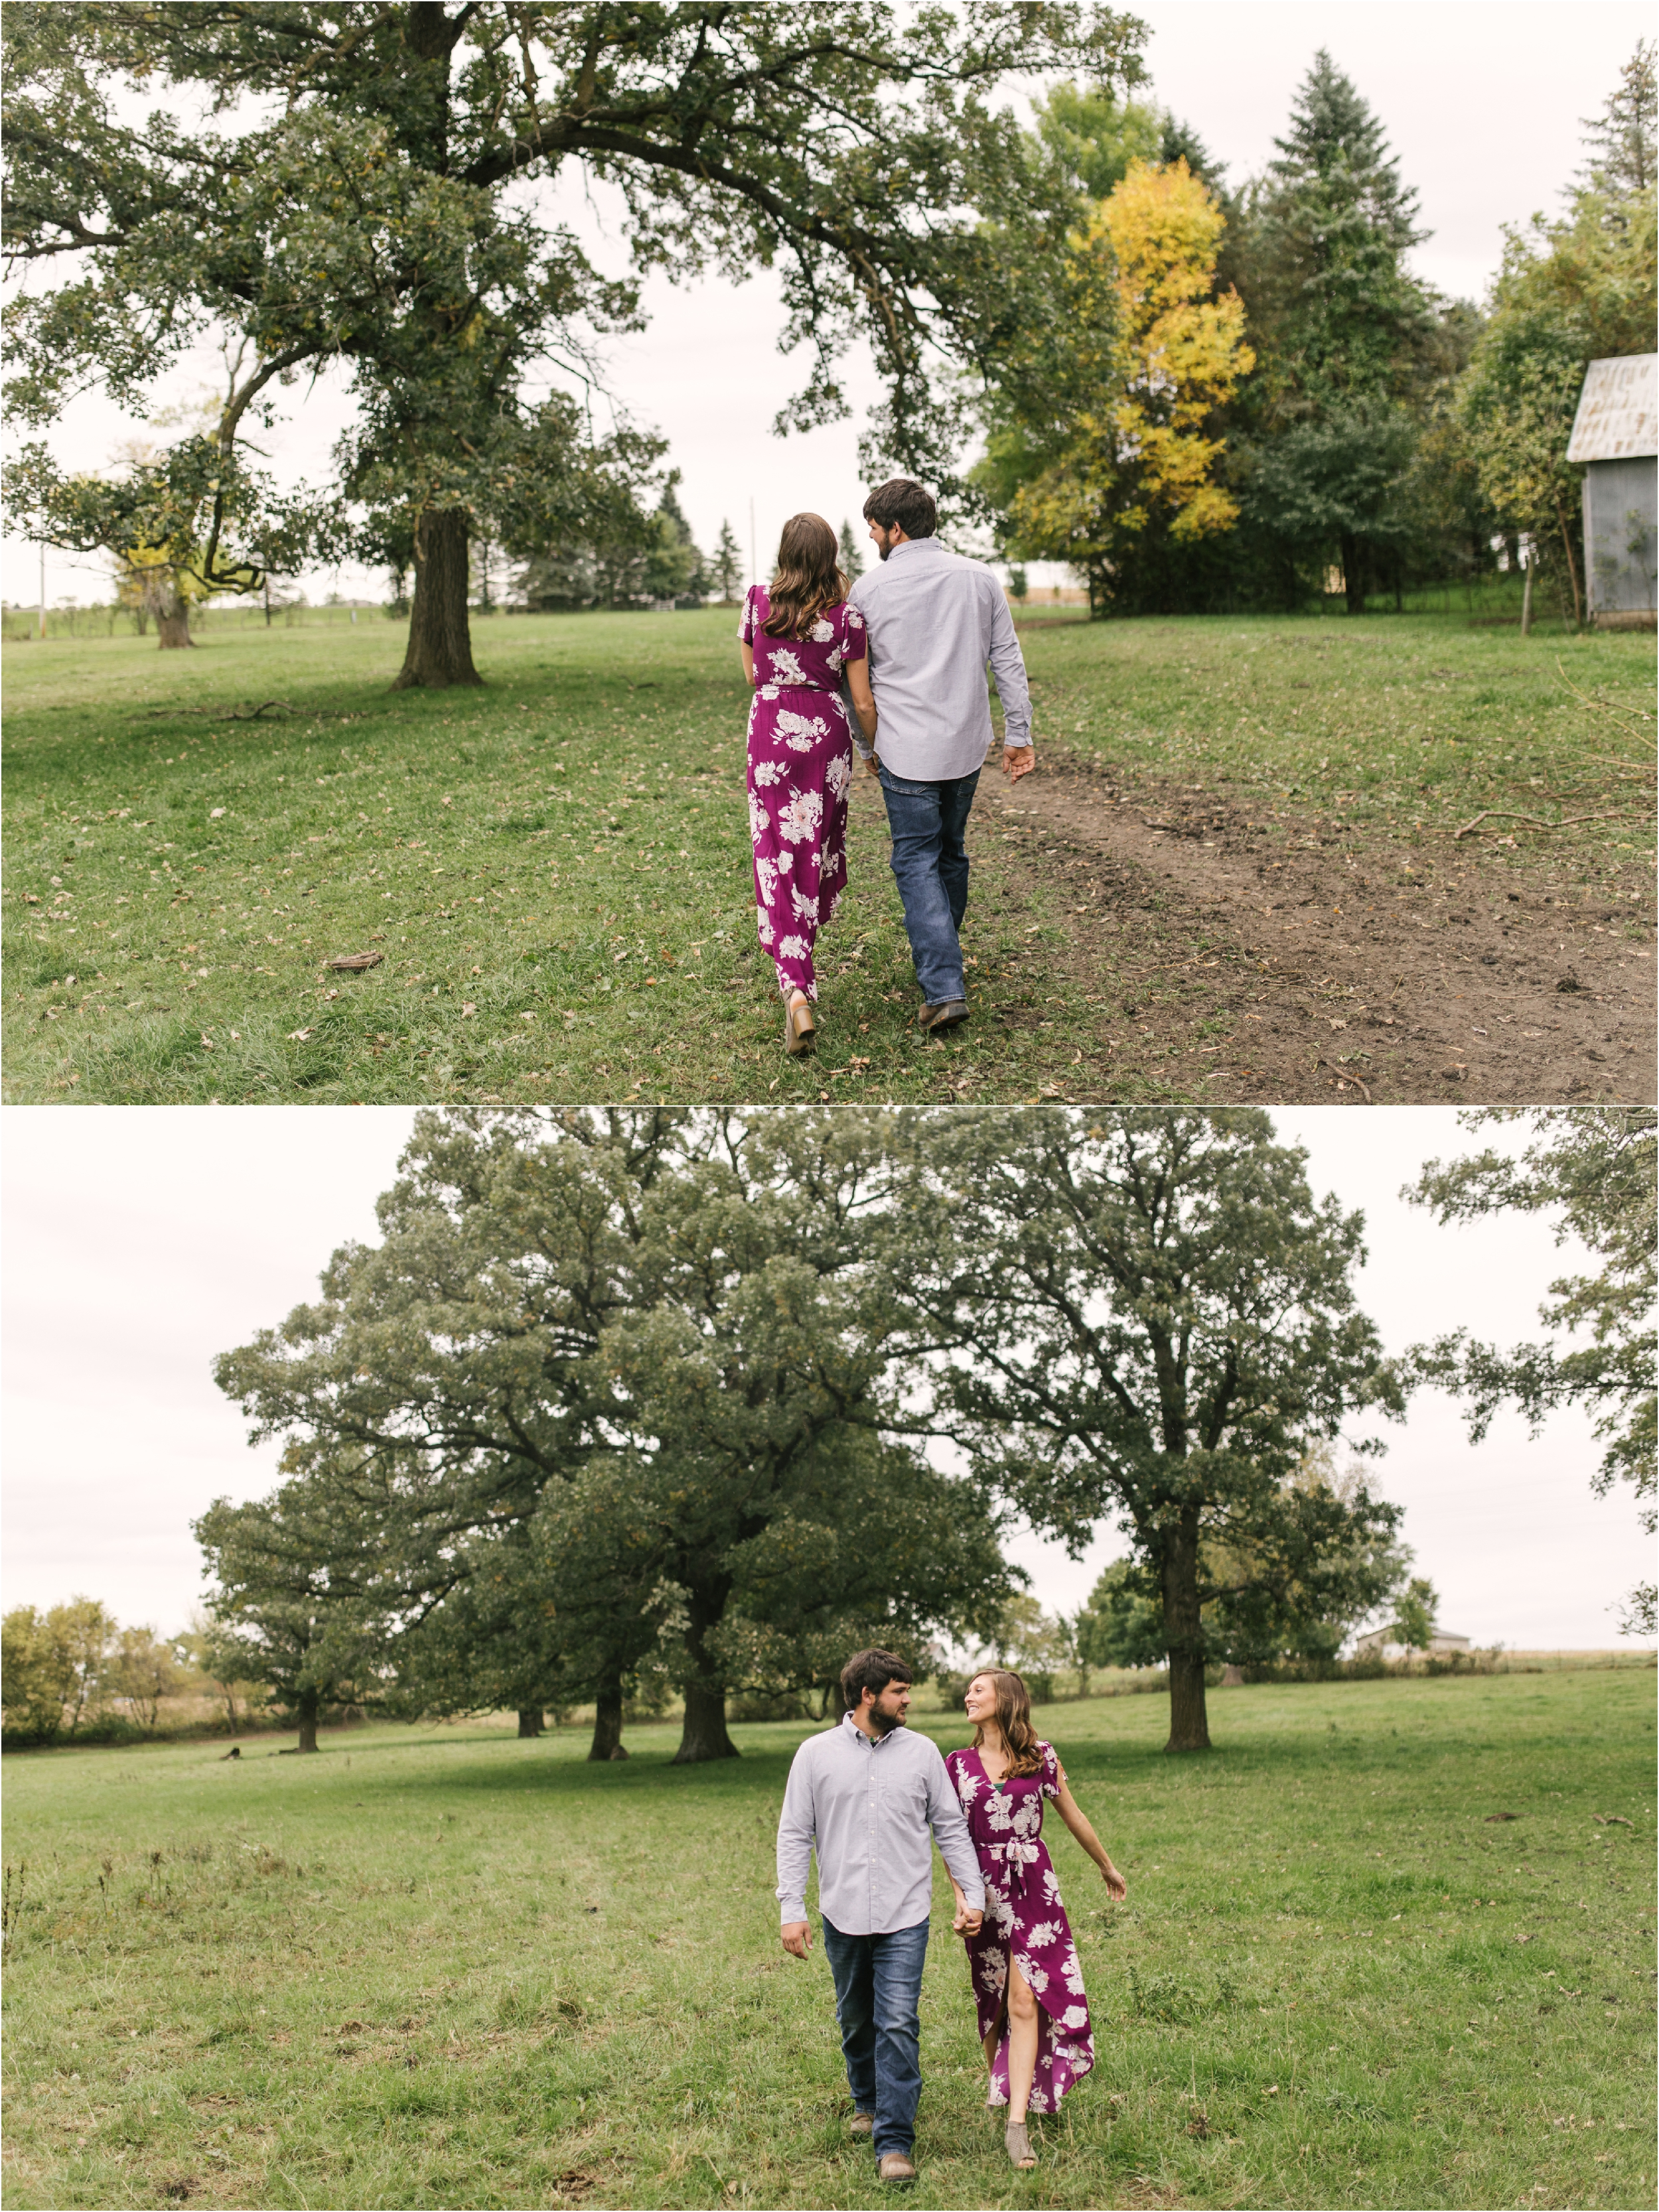 Countryside Engagement Photos_ Minnesota Wedding Photographer_Stephanie Lynn Photography_0062.jpg